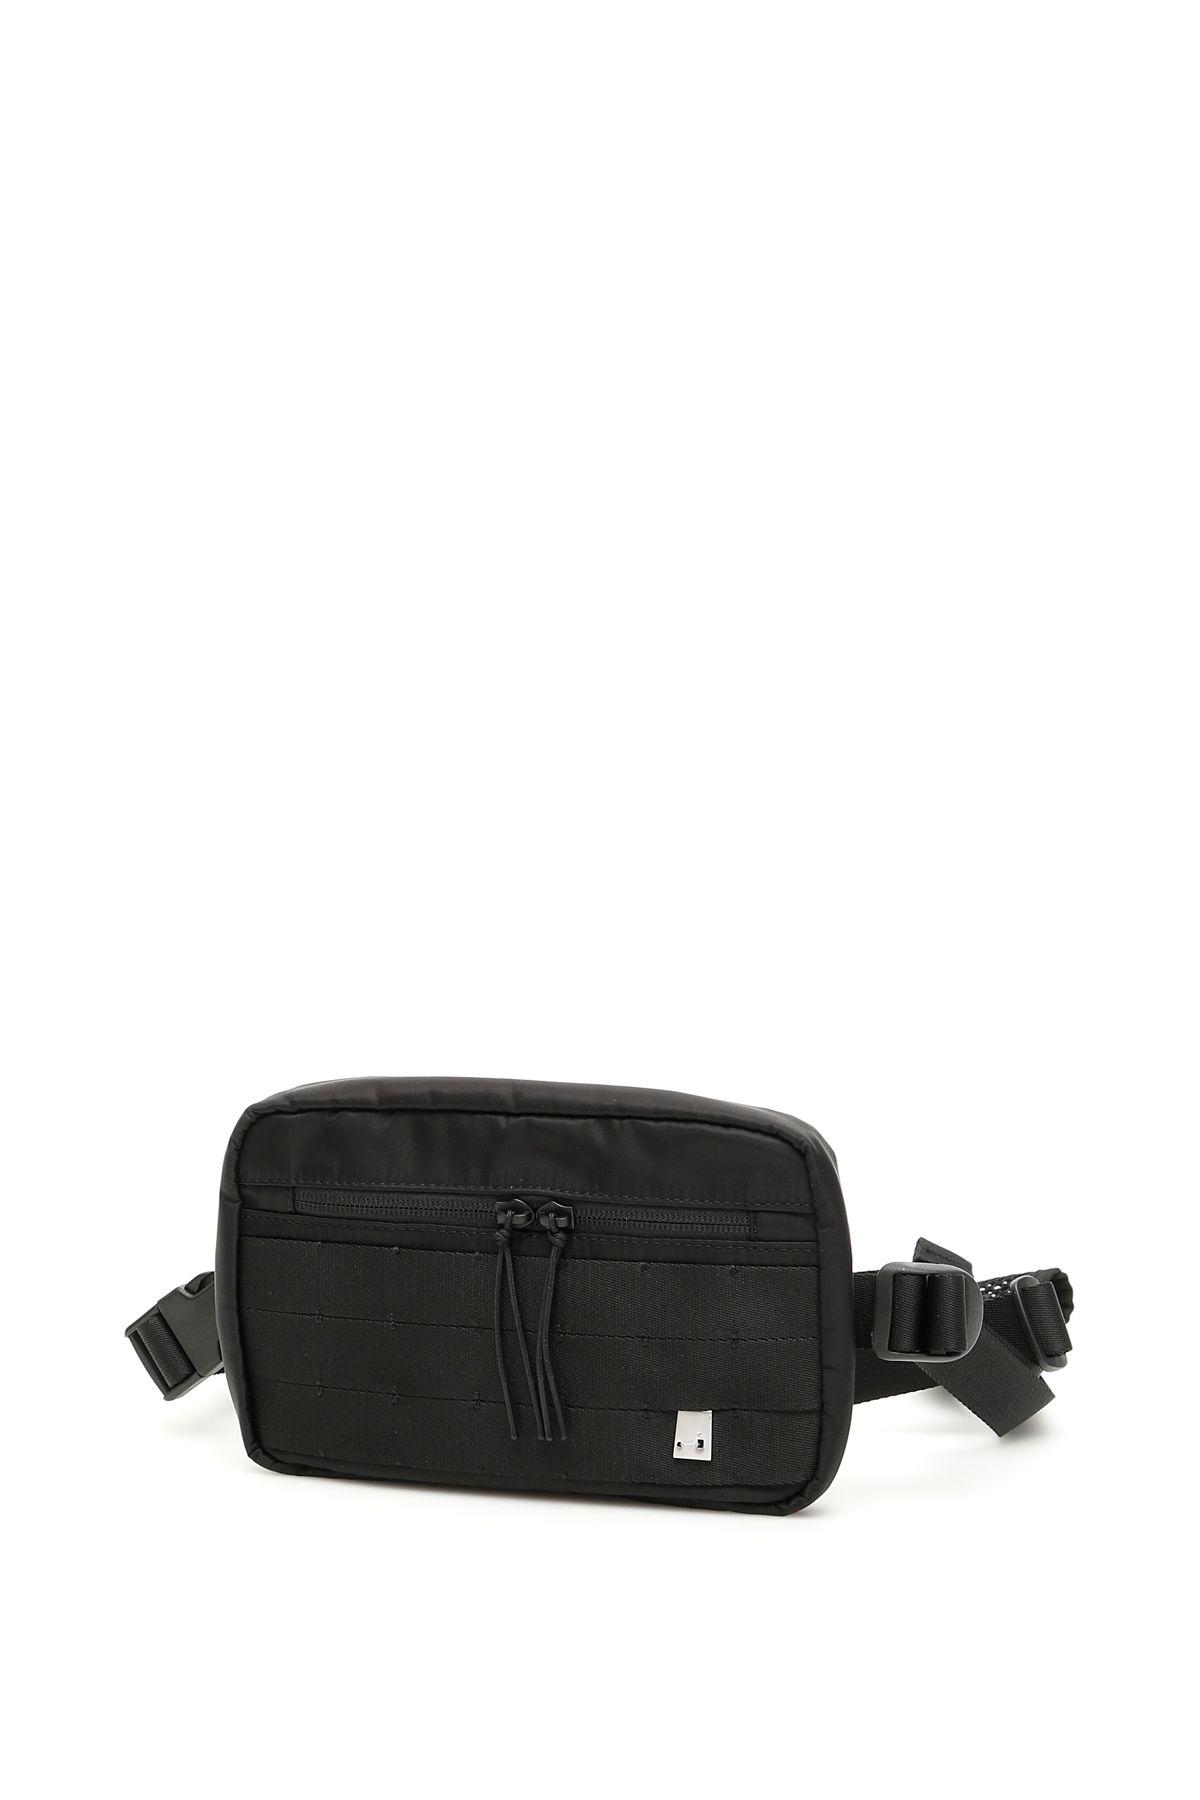 Alyx Chest Rig Belt Bag